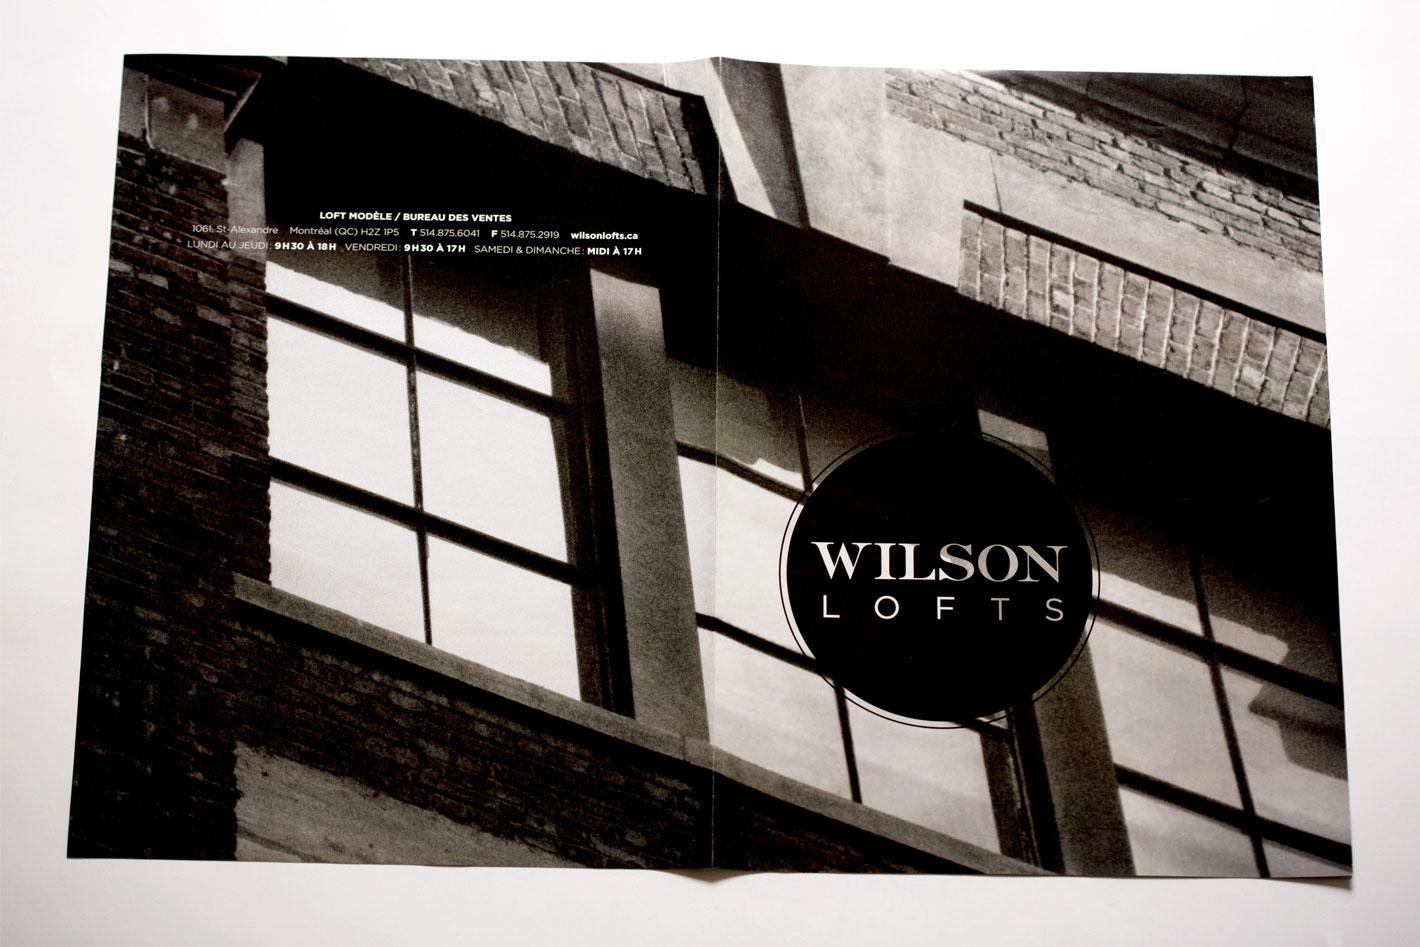 Wilson_IMGS_1420x947portefolio-0537